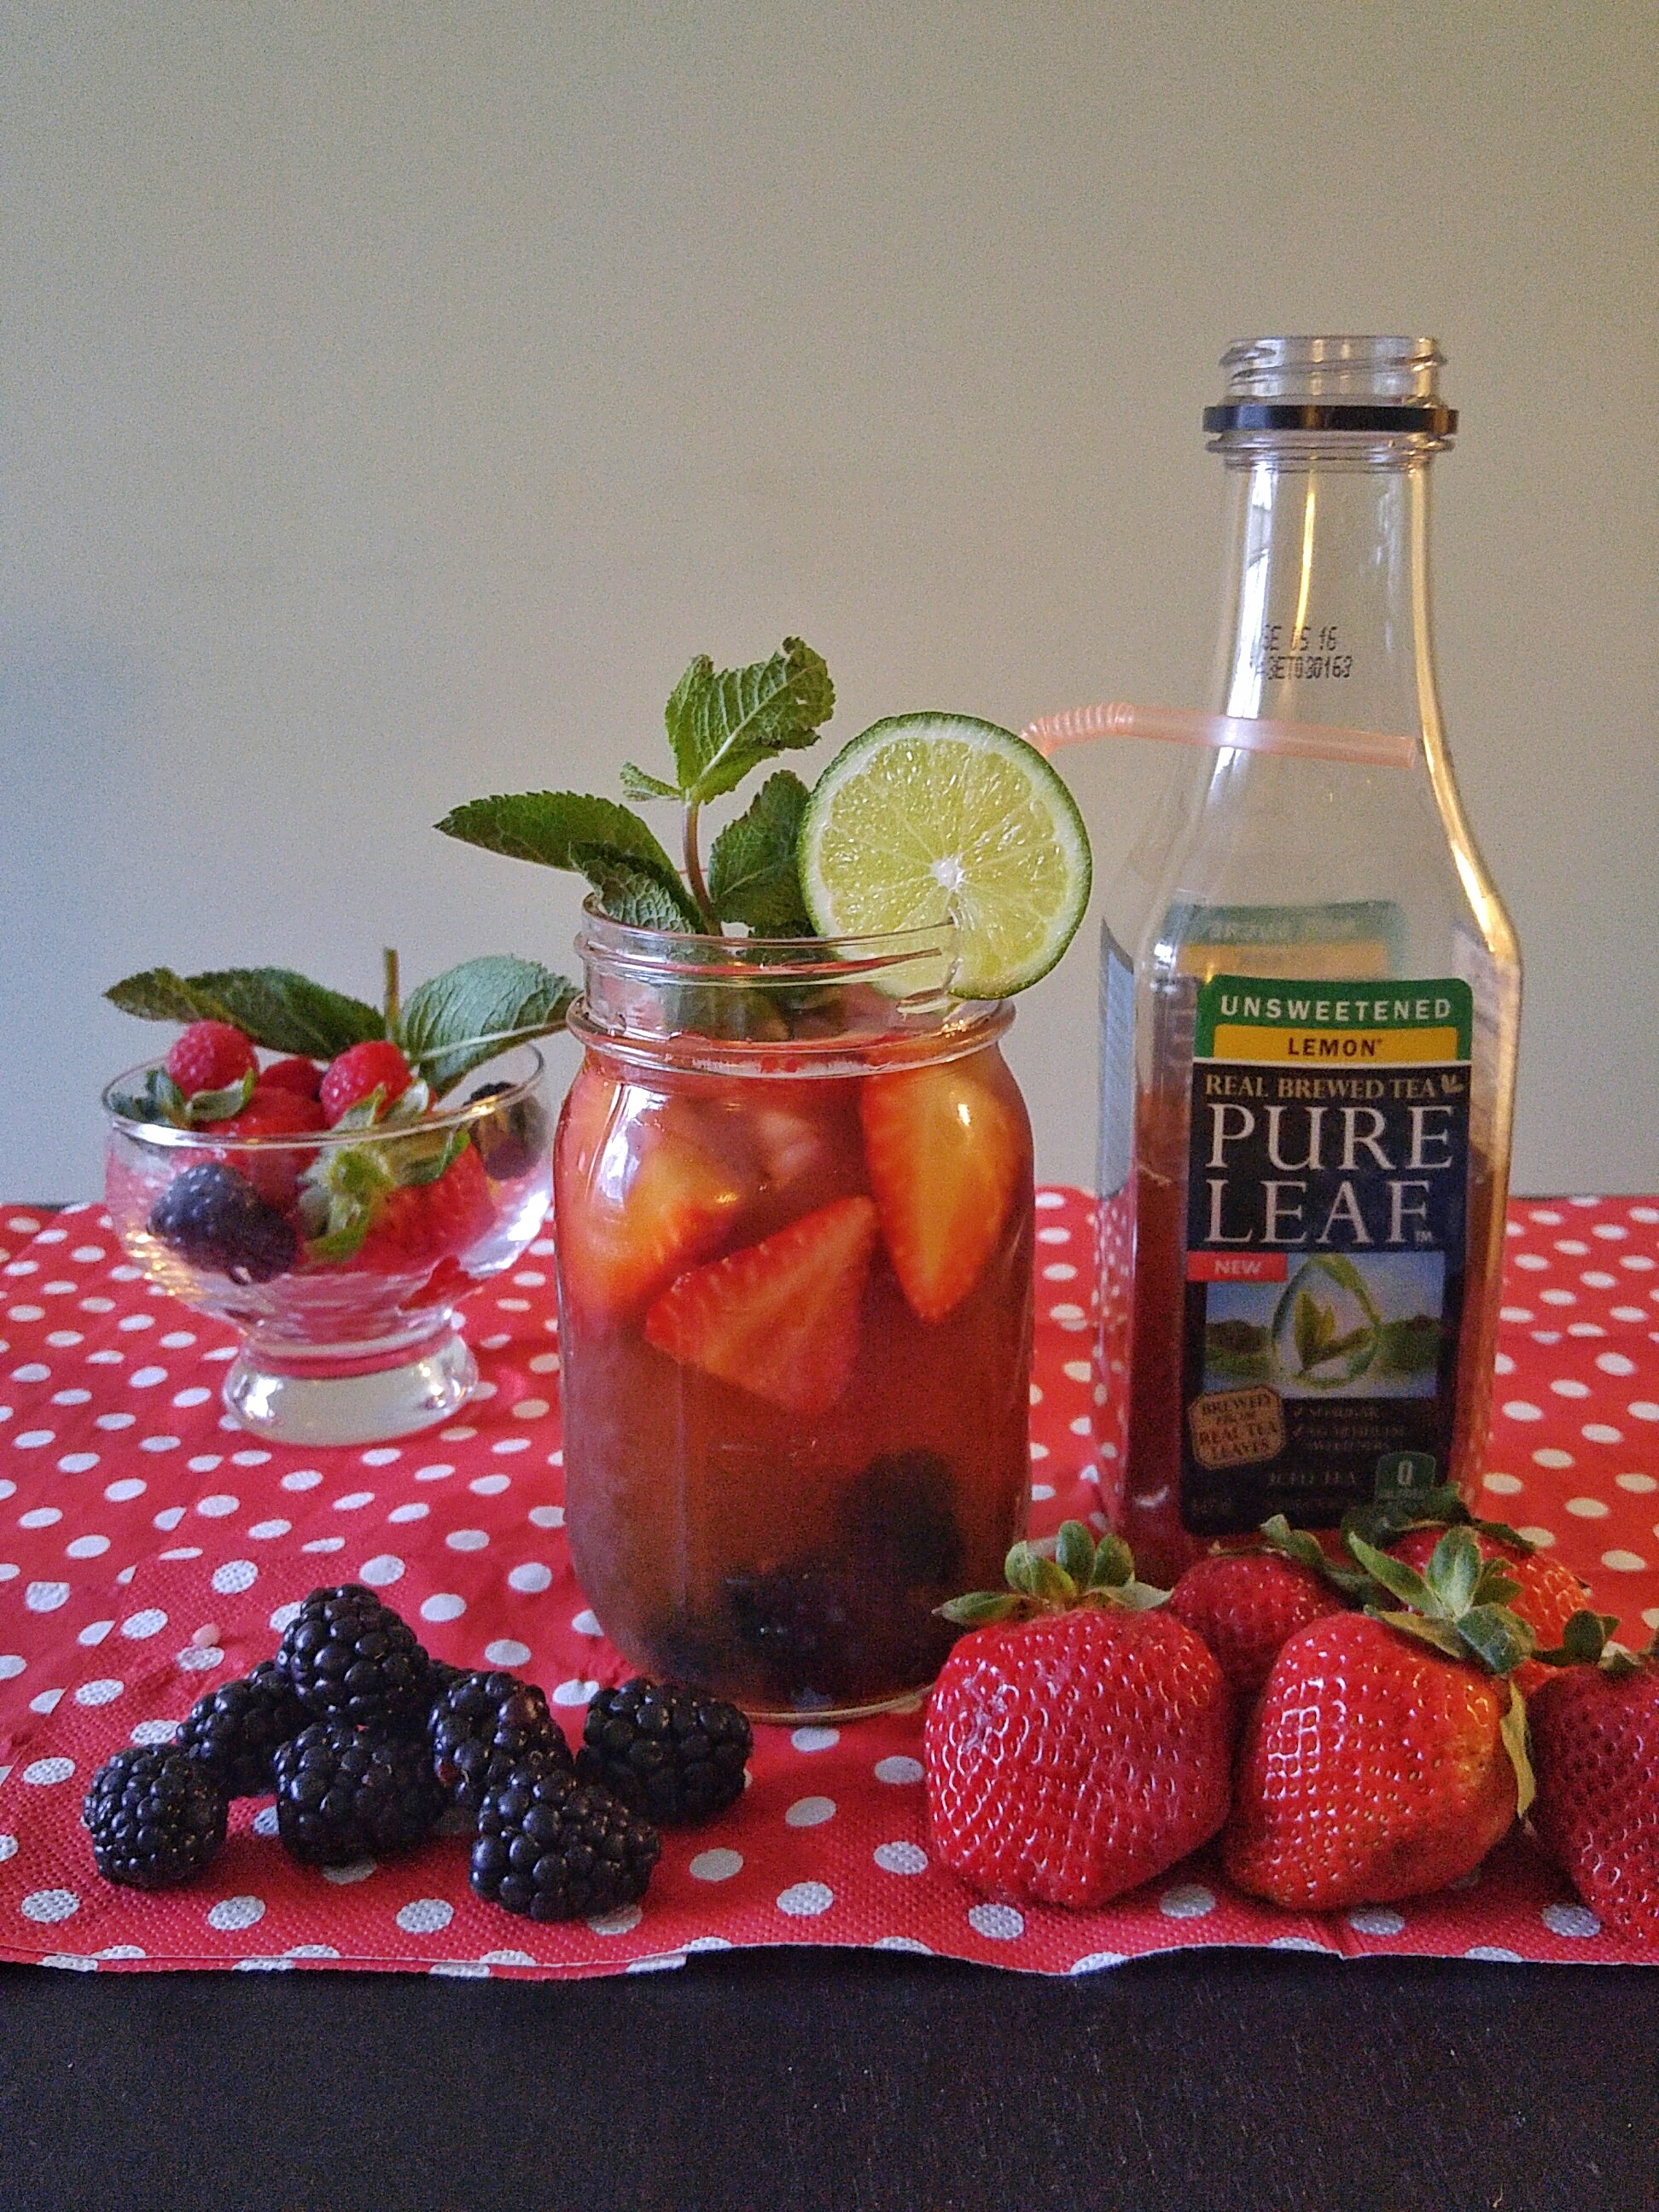 Strawberries + Blackberries mixed with Unsweetened Pure Leaf Lemon Tea